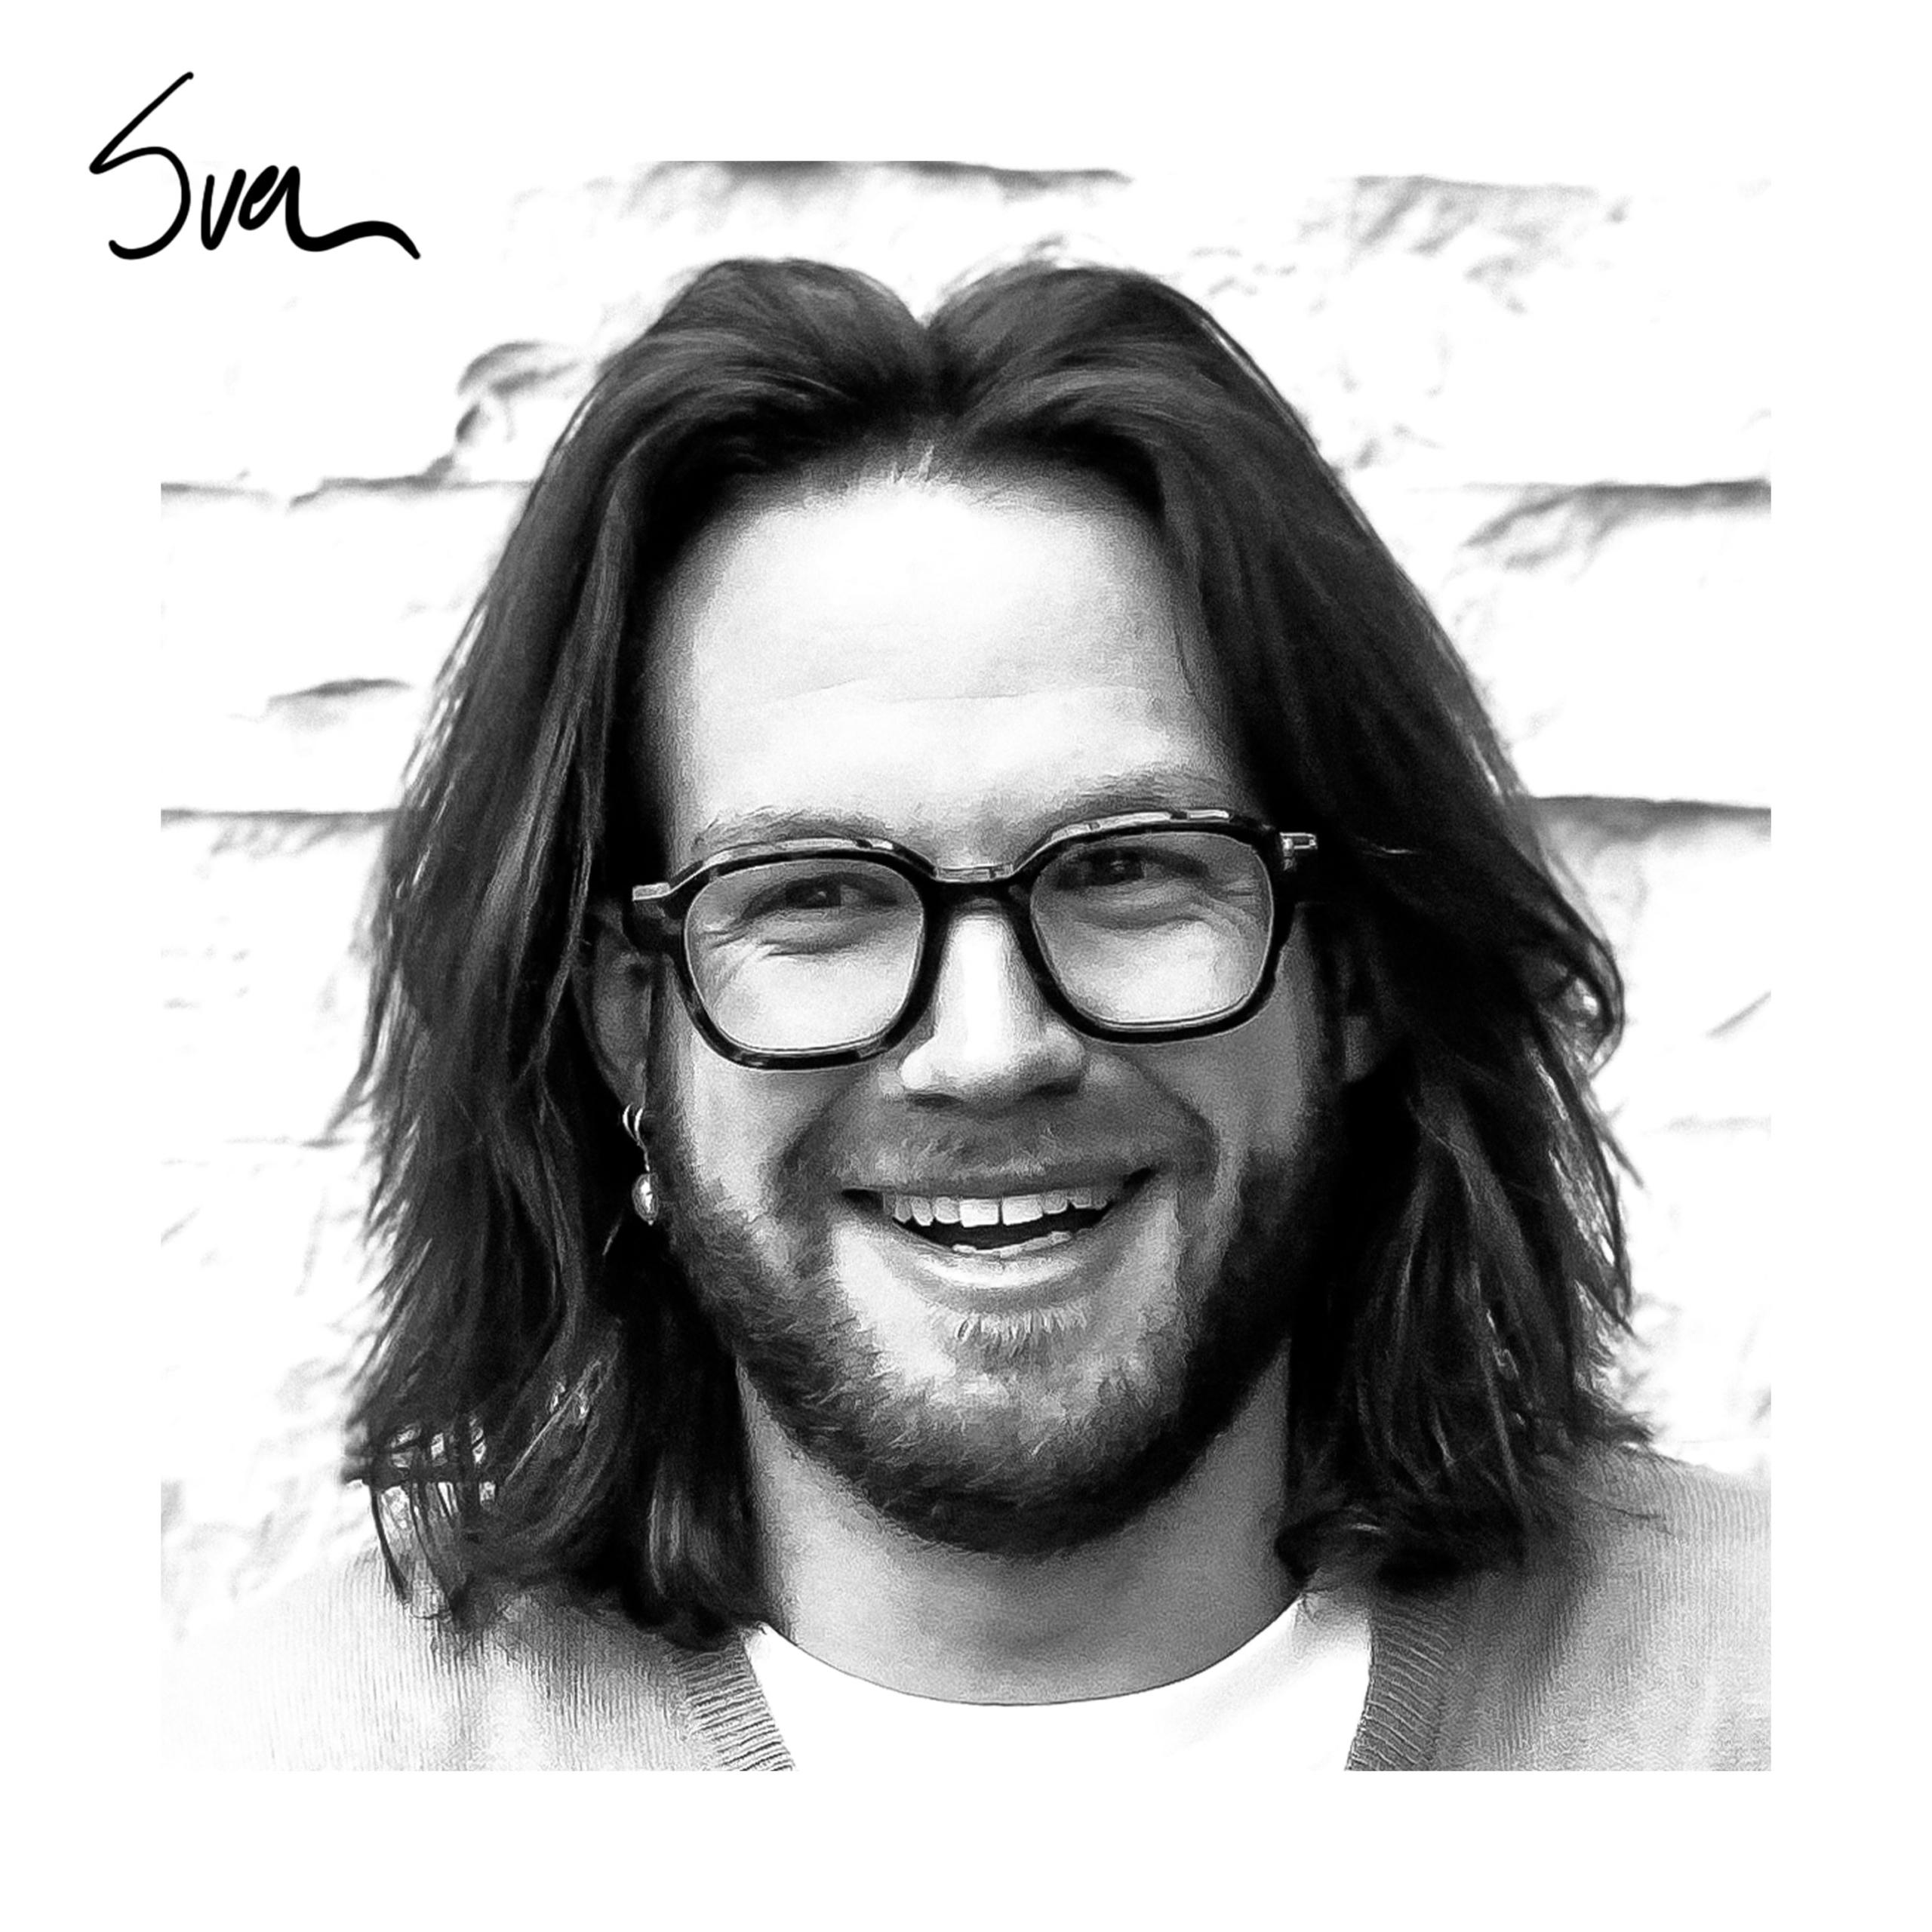 Sven Stas